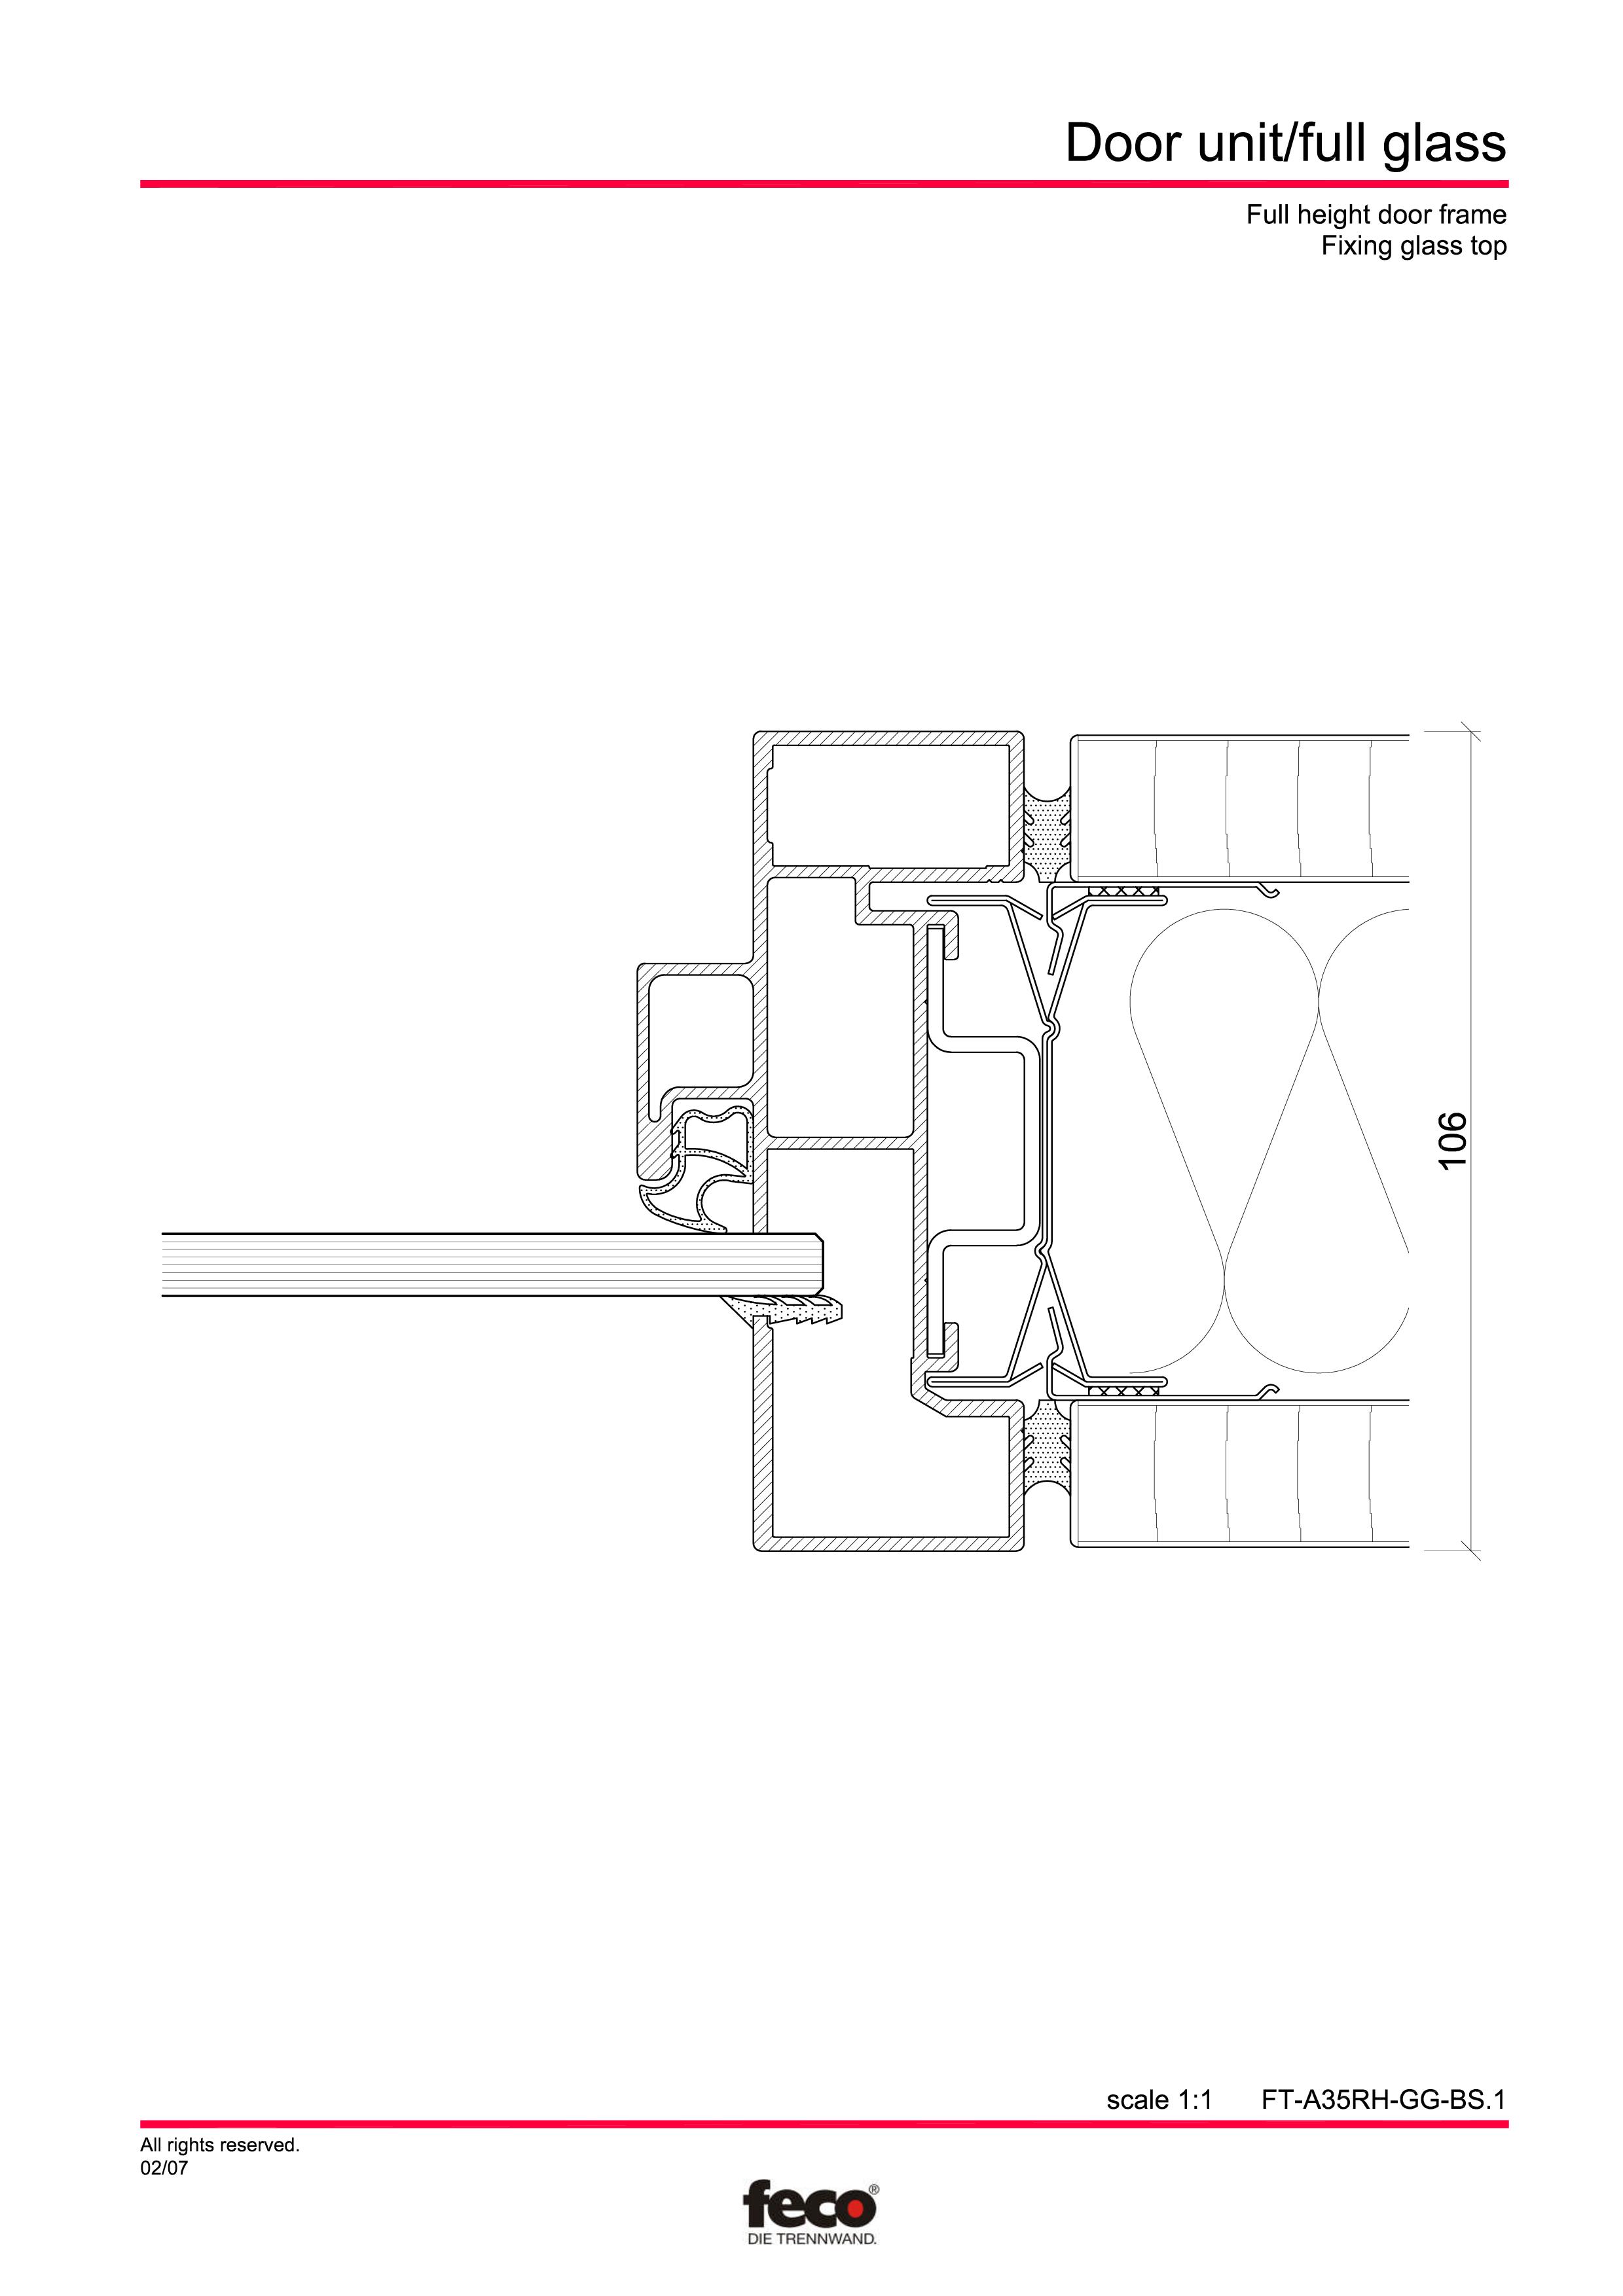 Pagina 2 - CAD-PDF Usa de sticla (pana la planseu) FECO Detaliu de montaj